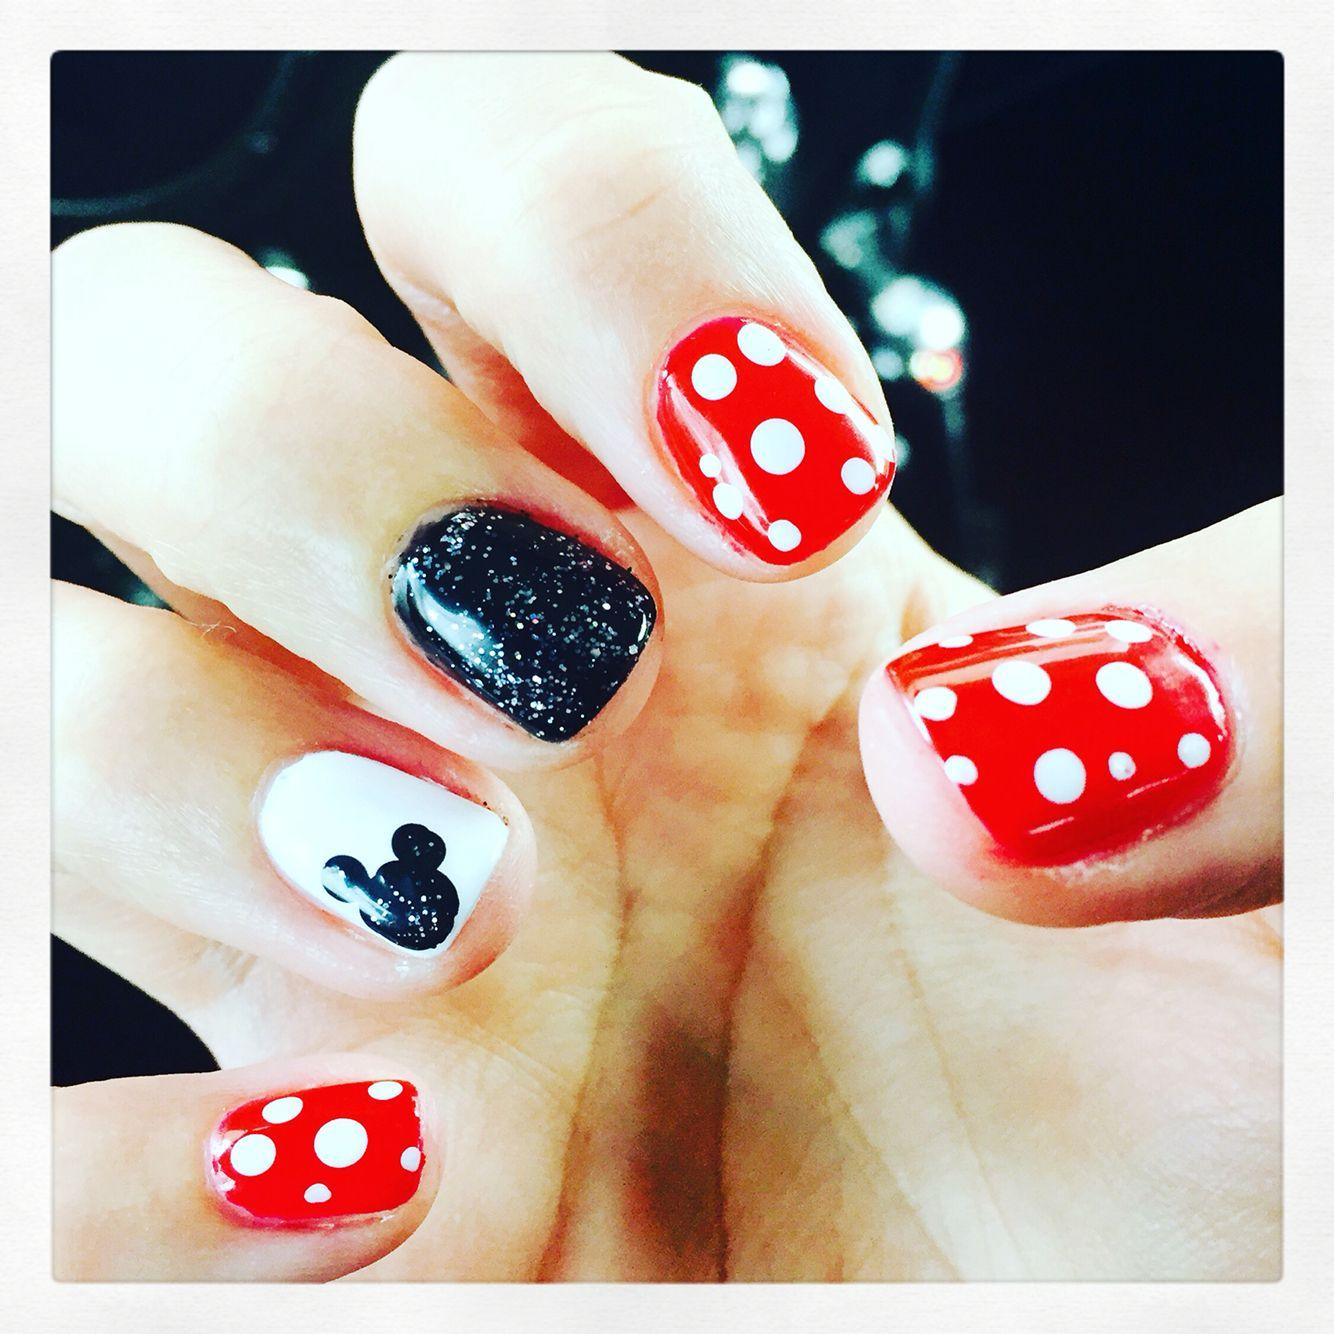 Disney nails. #mickeymouse #disneynails #minniemouse #mickeymouse ...